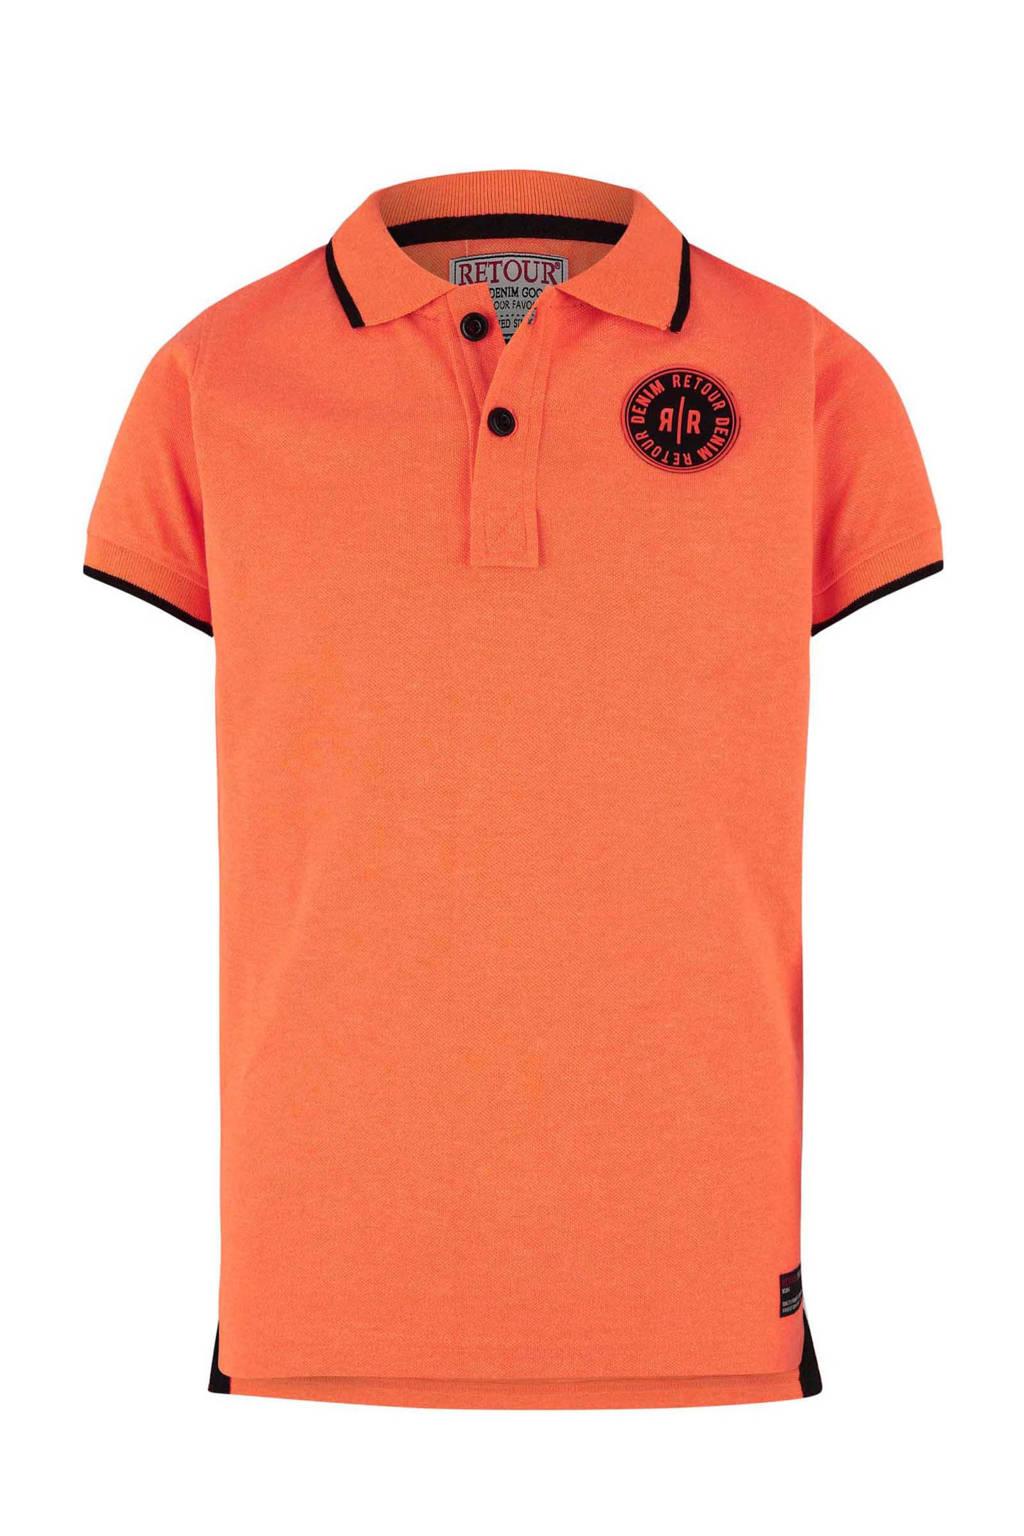 Retour Denim polo Lucas oranje, Oranje